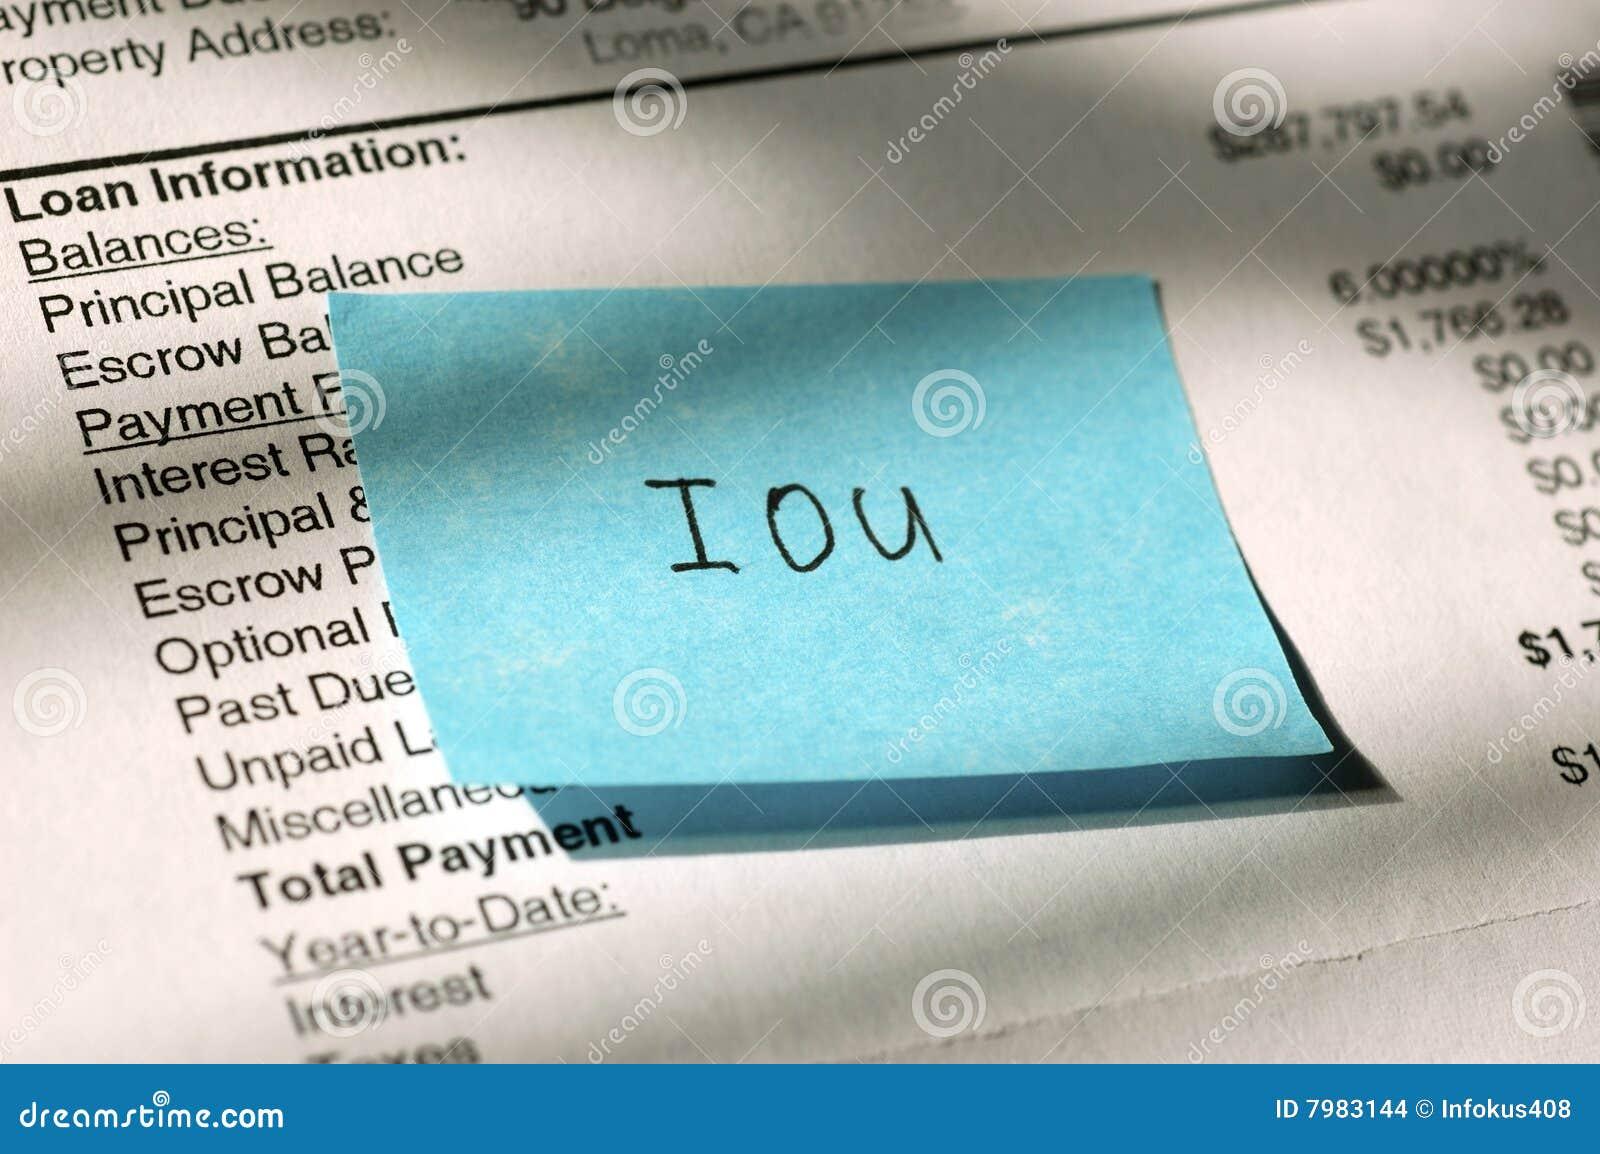 Loan IOU